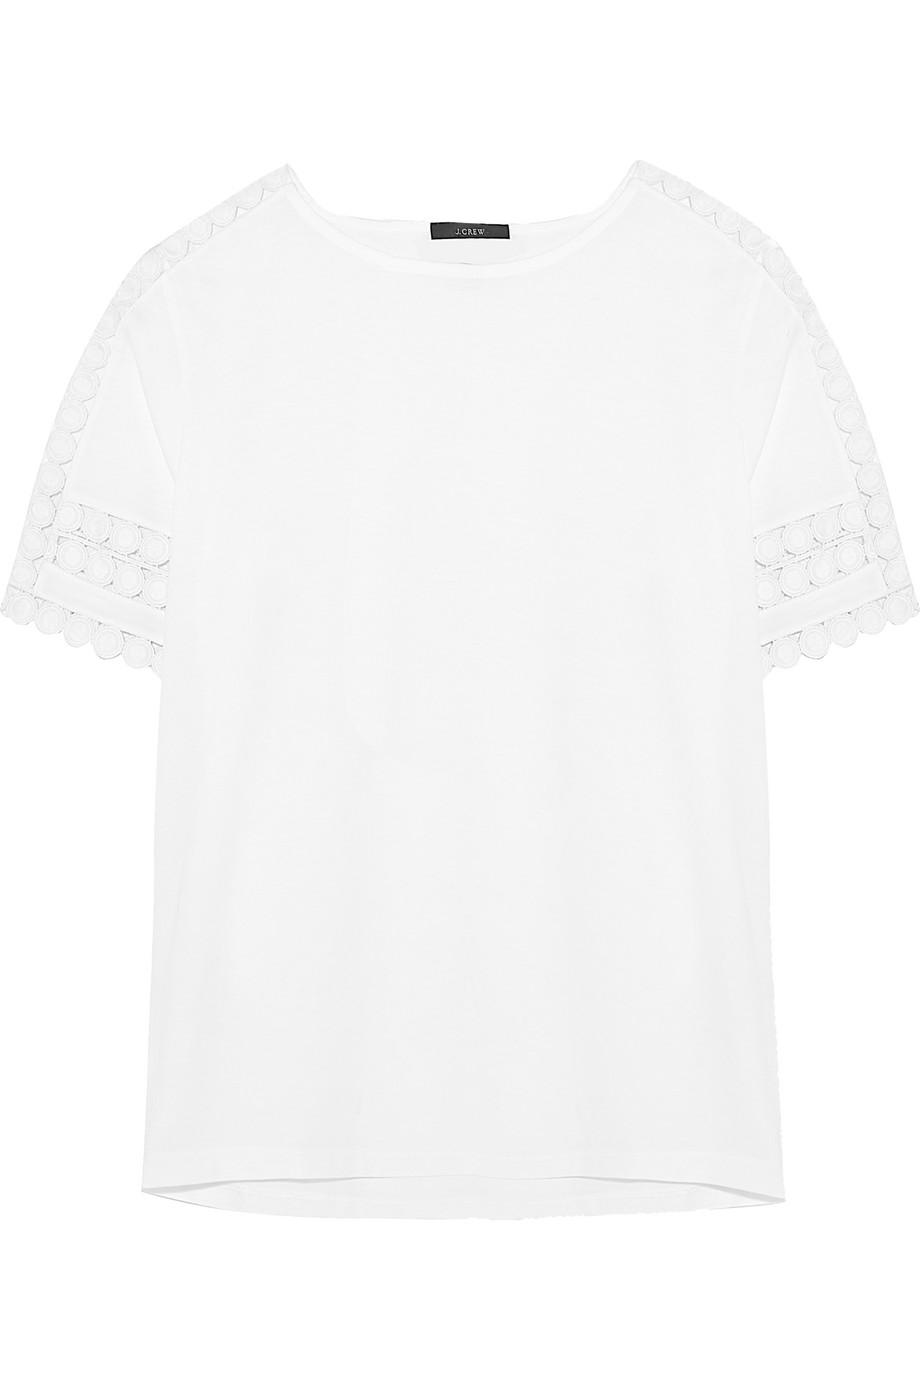 J.Crew Crochet-Paneled Cotton-Jersey T-Shirt, White, Women's